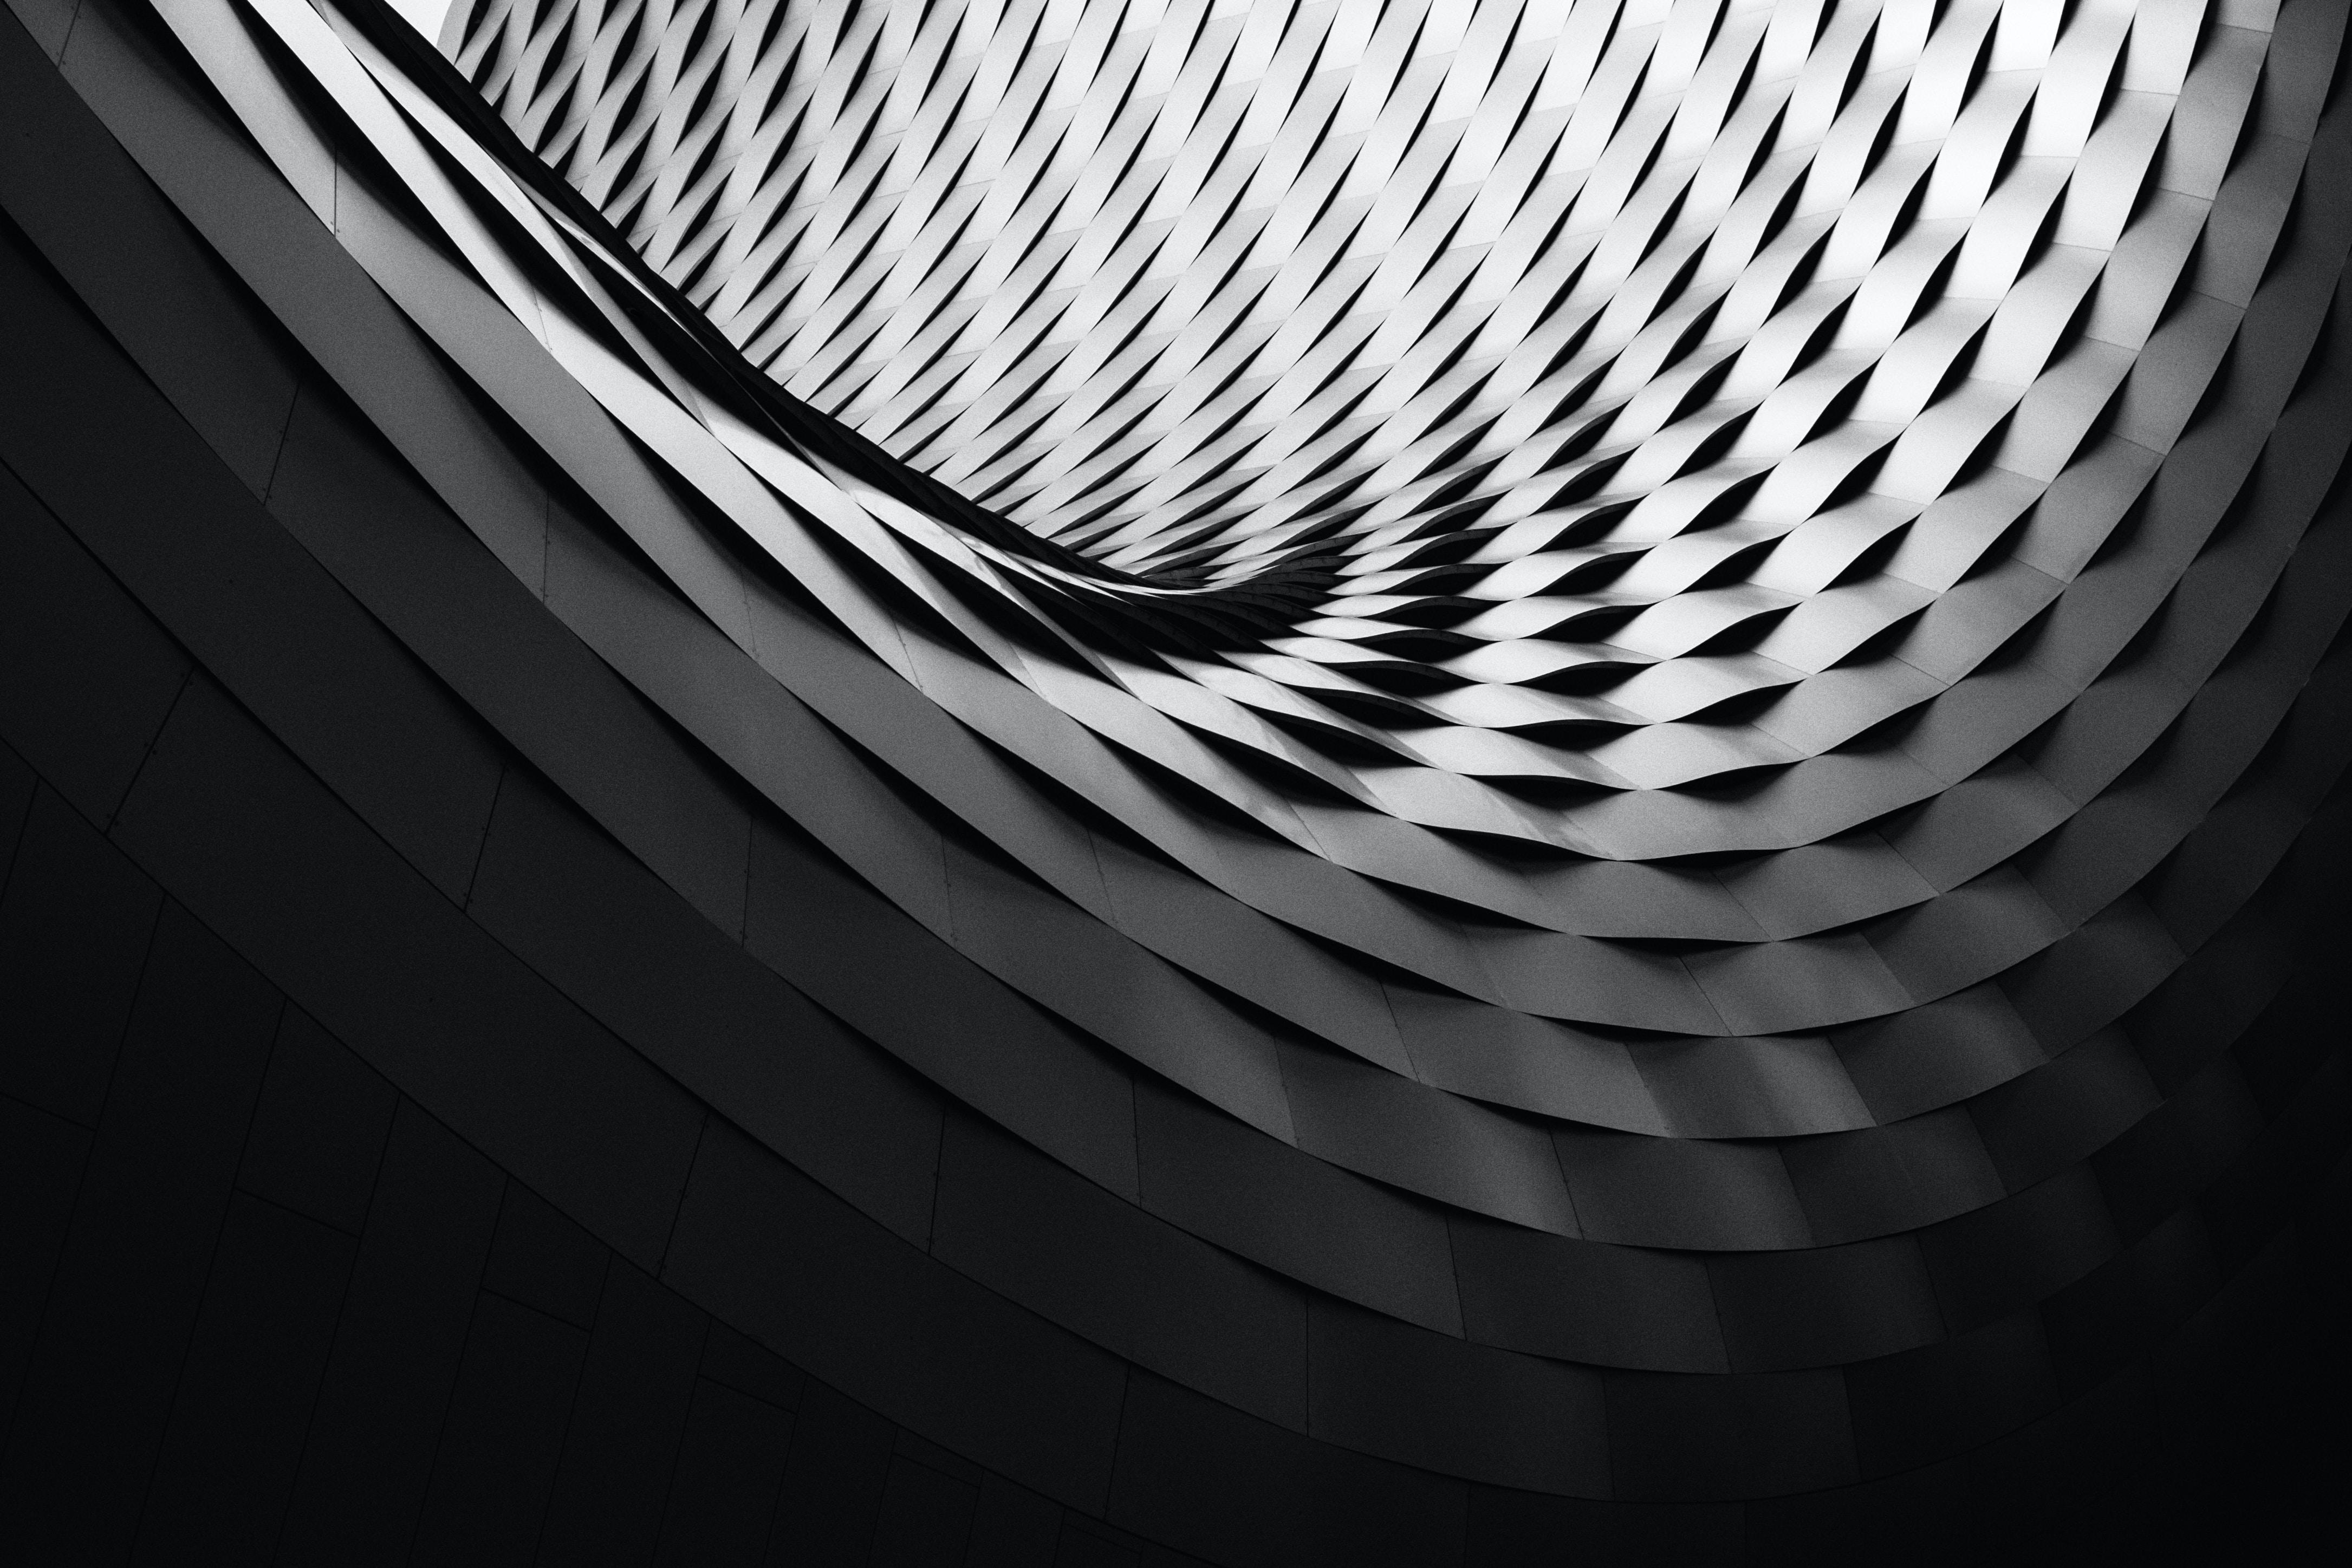 grayscale spiral wallpaper